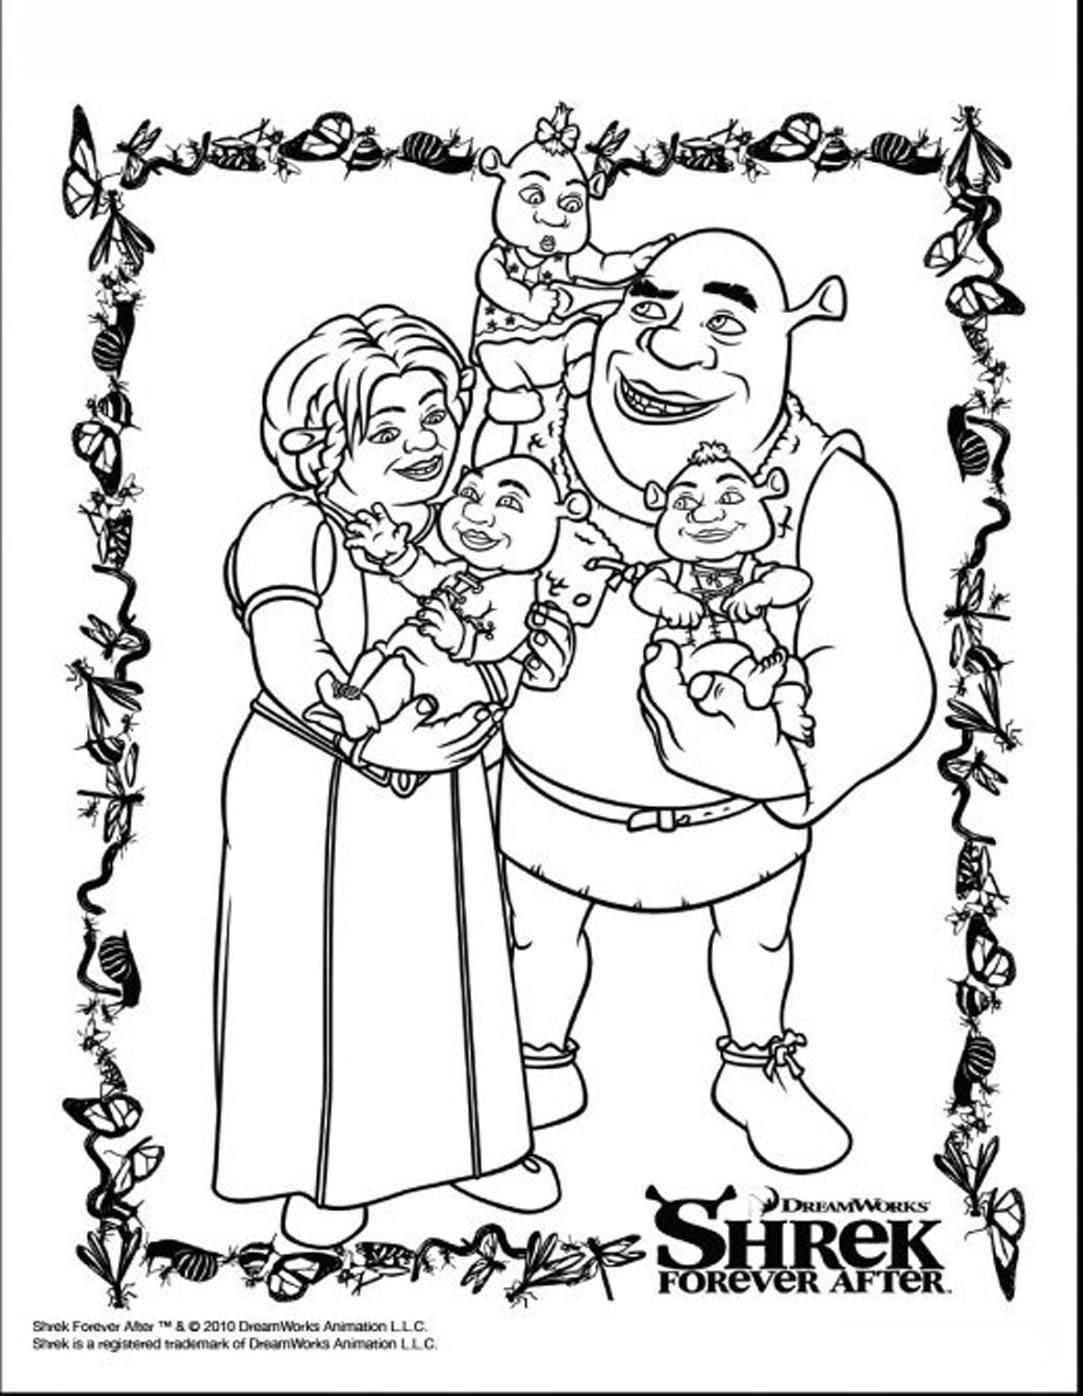 Joli portrait de la famille Shrek